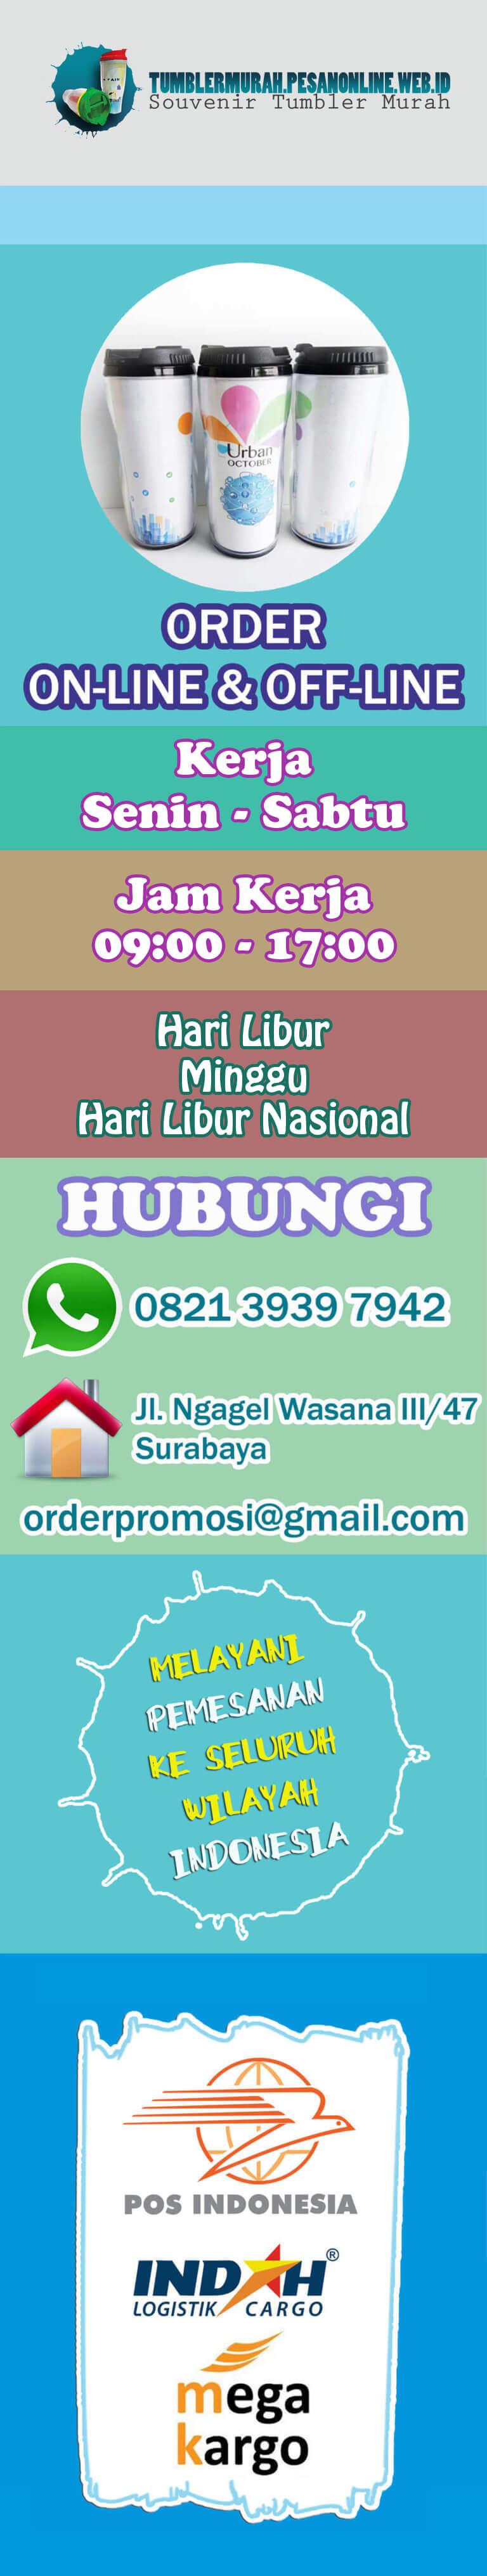 Banner Samping Souvenir Handuk Surabaya